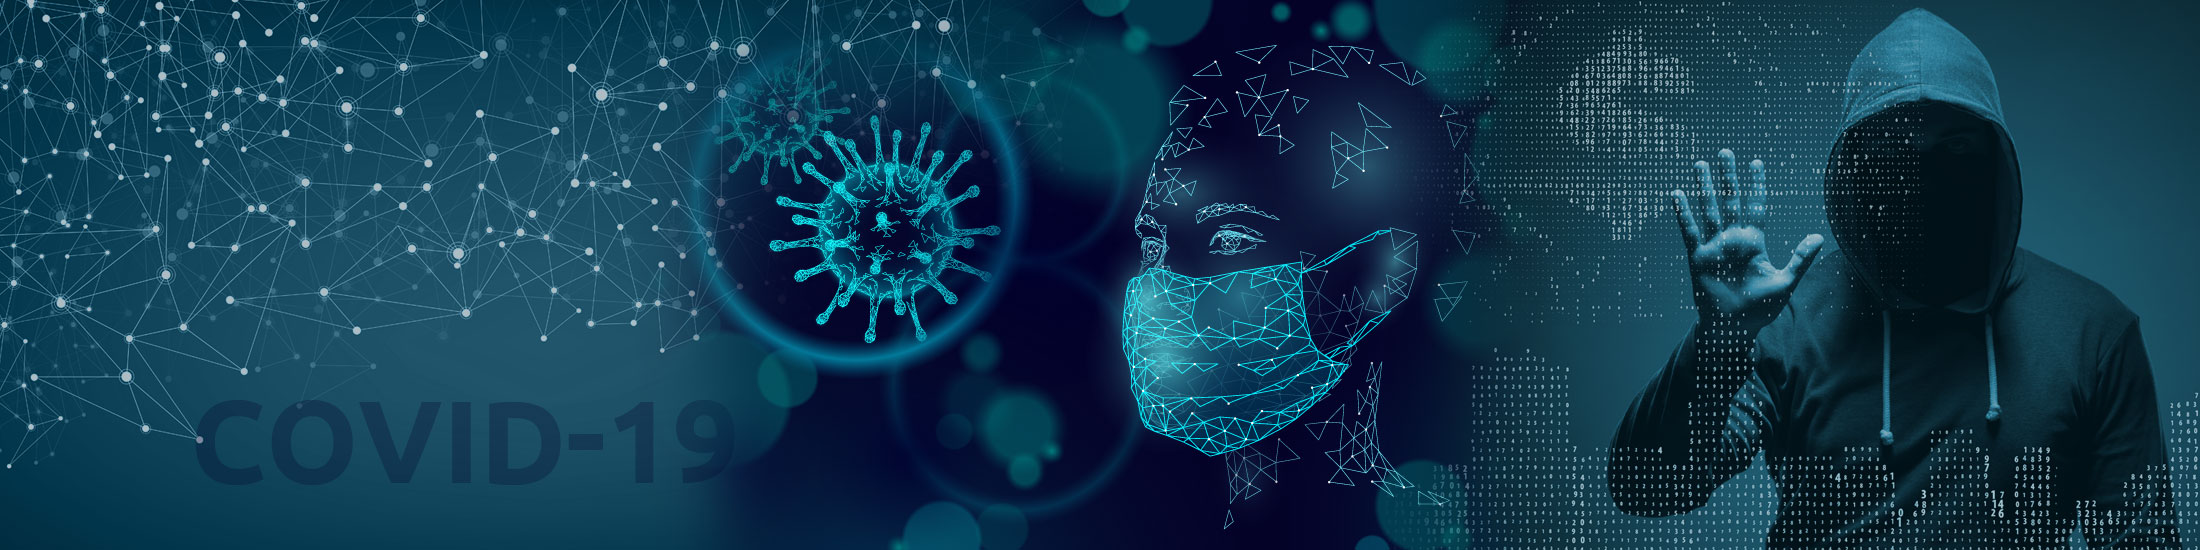 Fraudsters Take Advantage of Coronavirus Panic